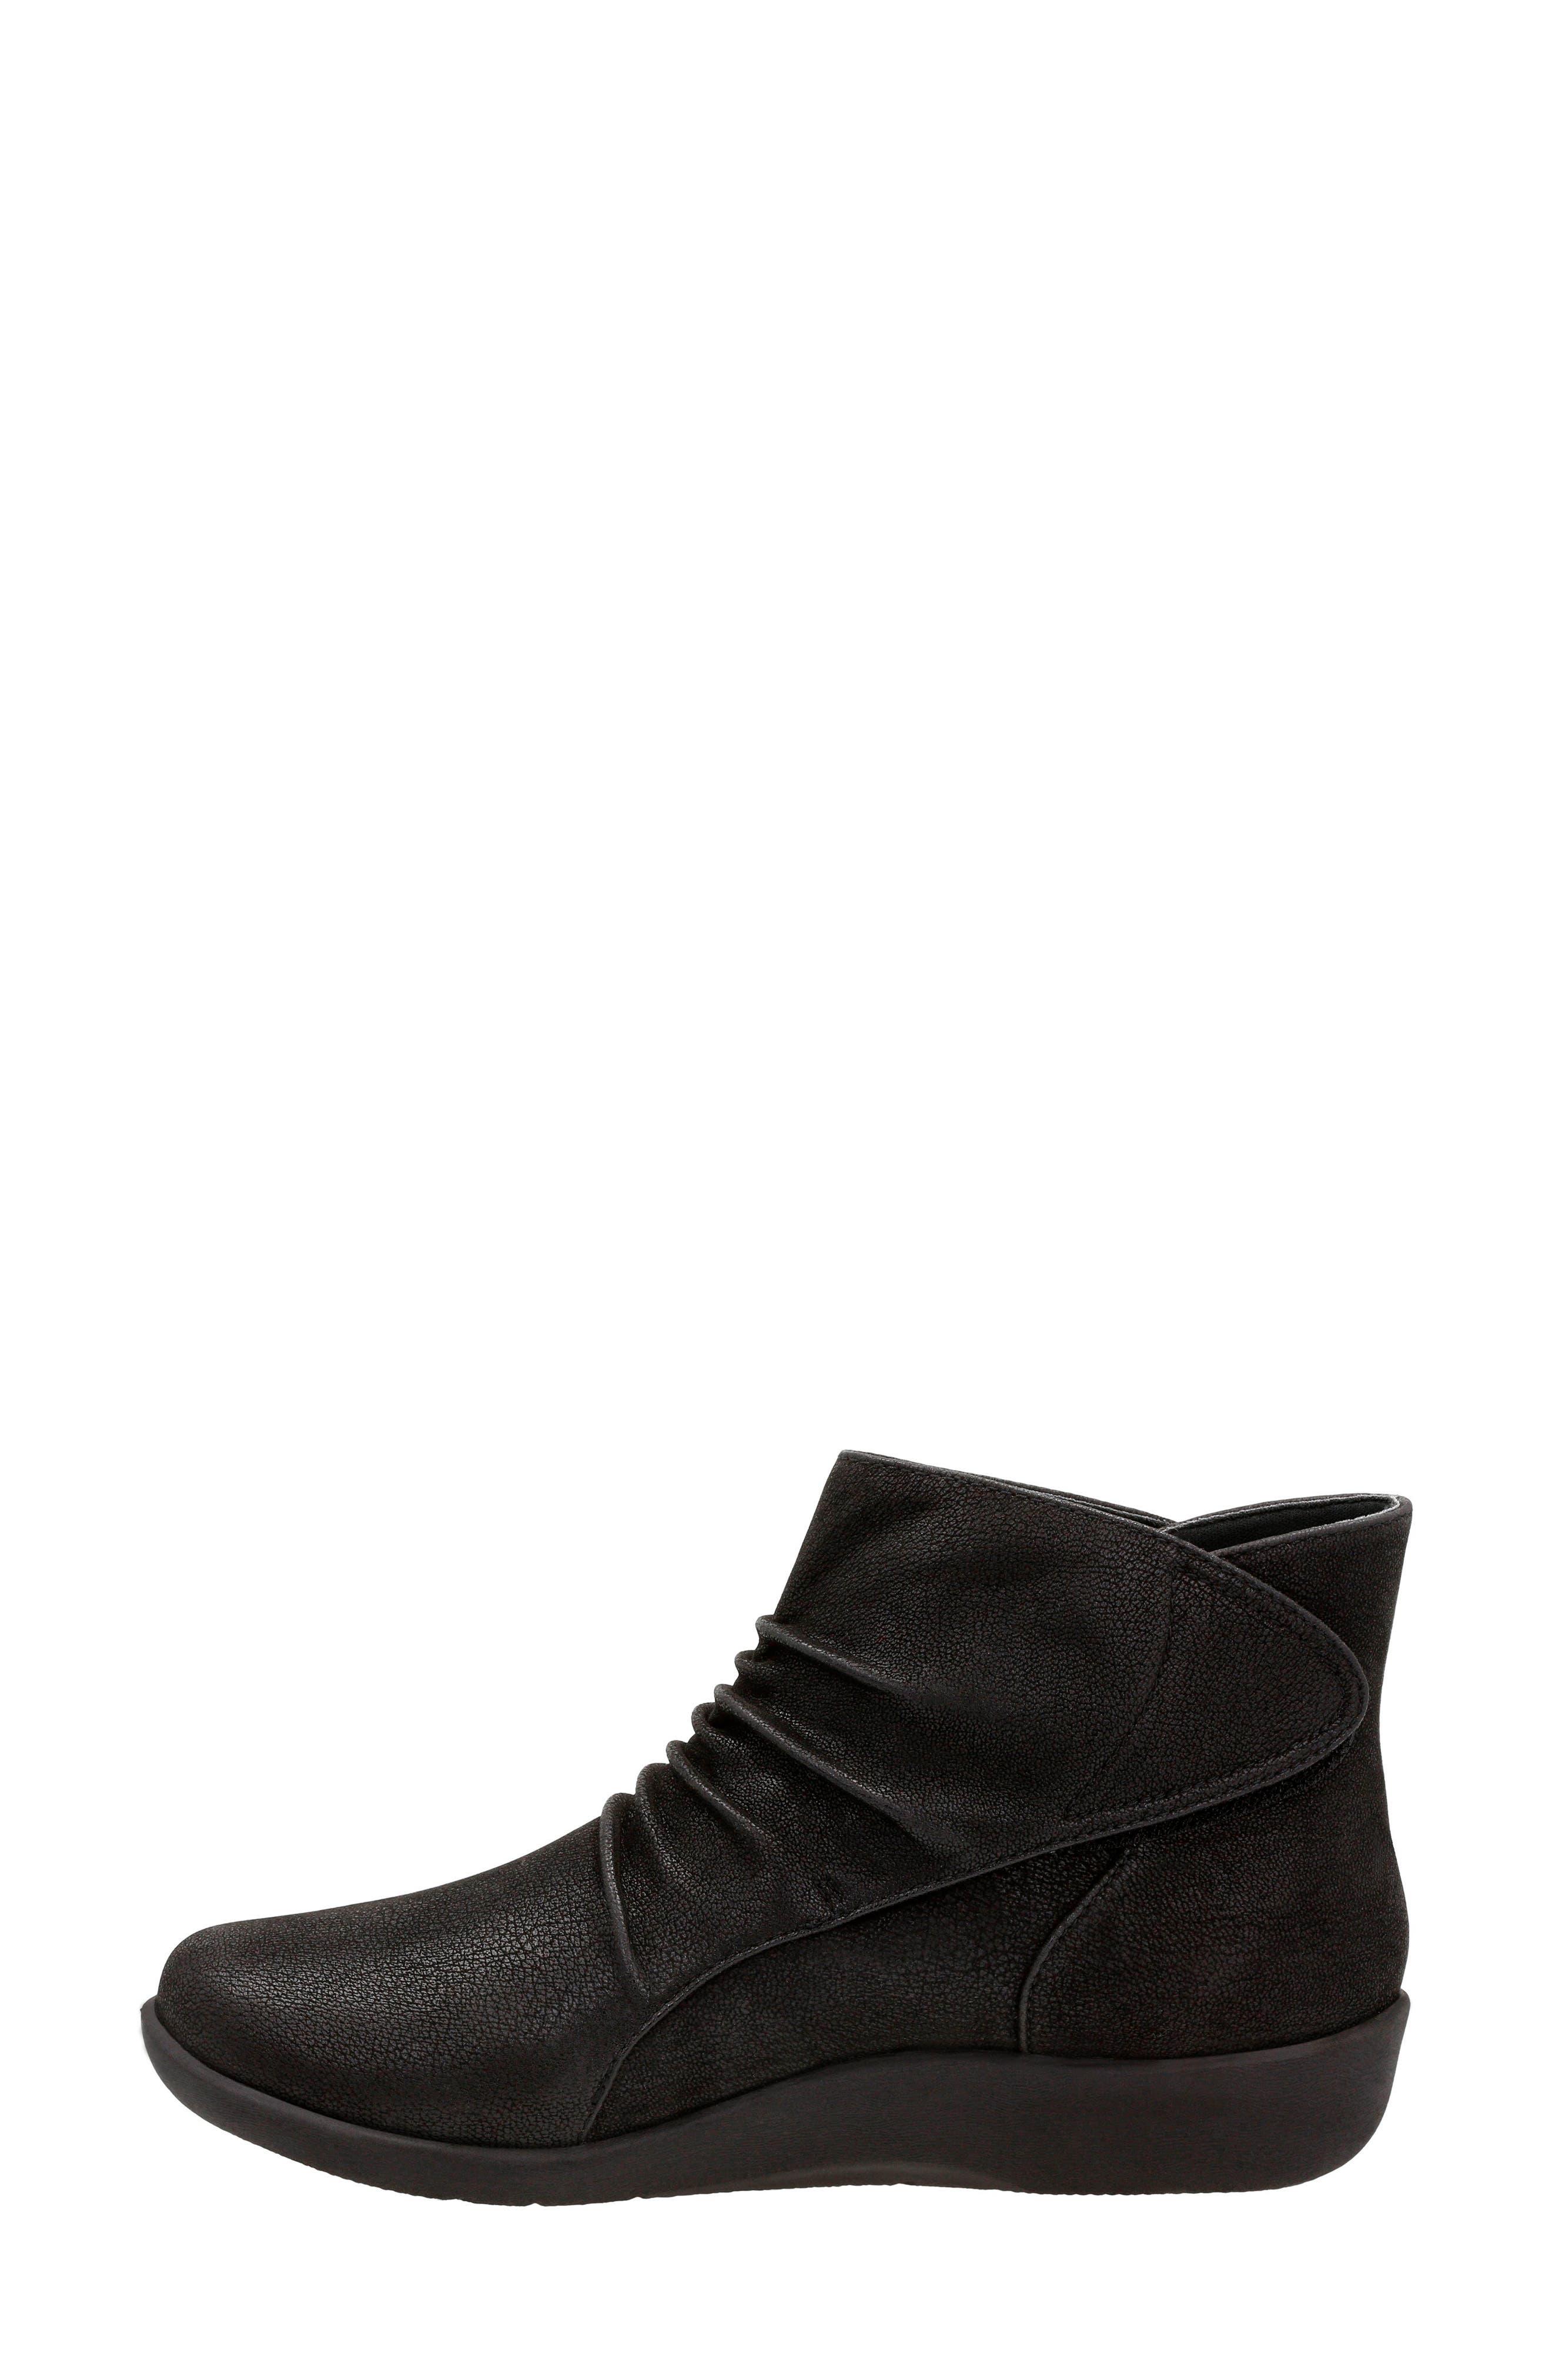 Sillian Sway Boot,                             Alternate thumbnail 2, color,                             Black Fabric